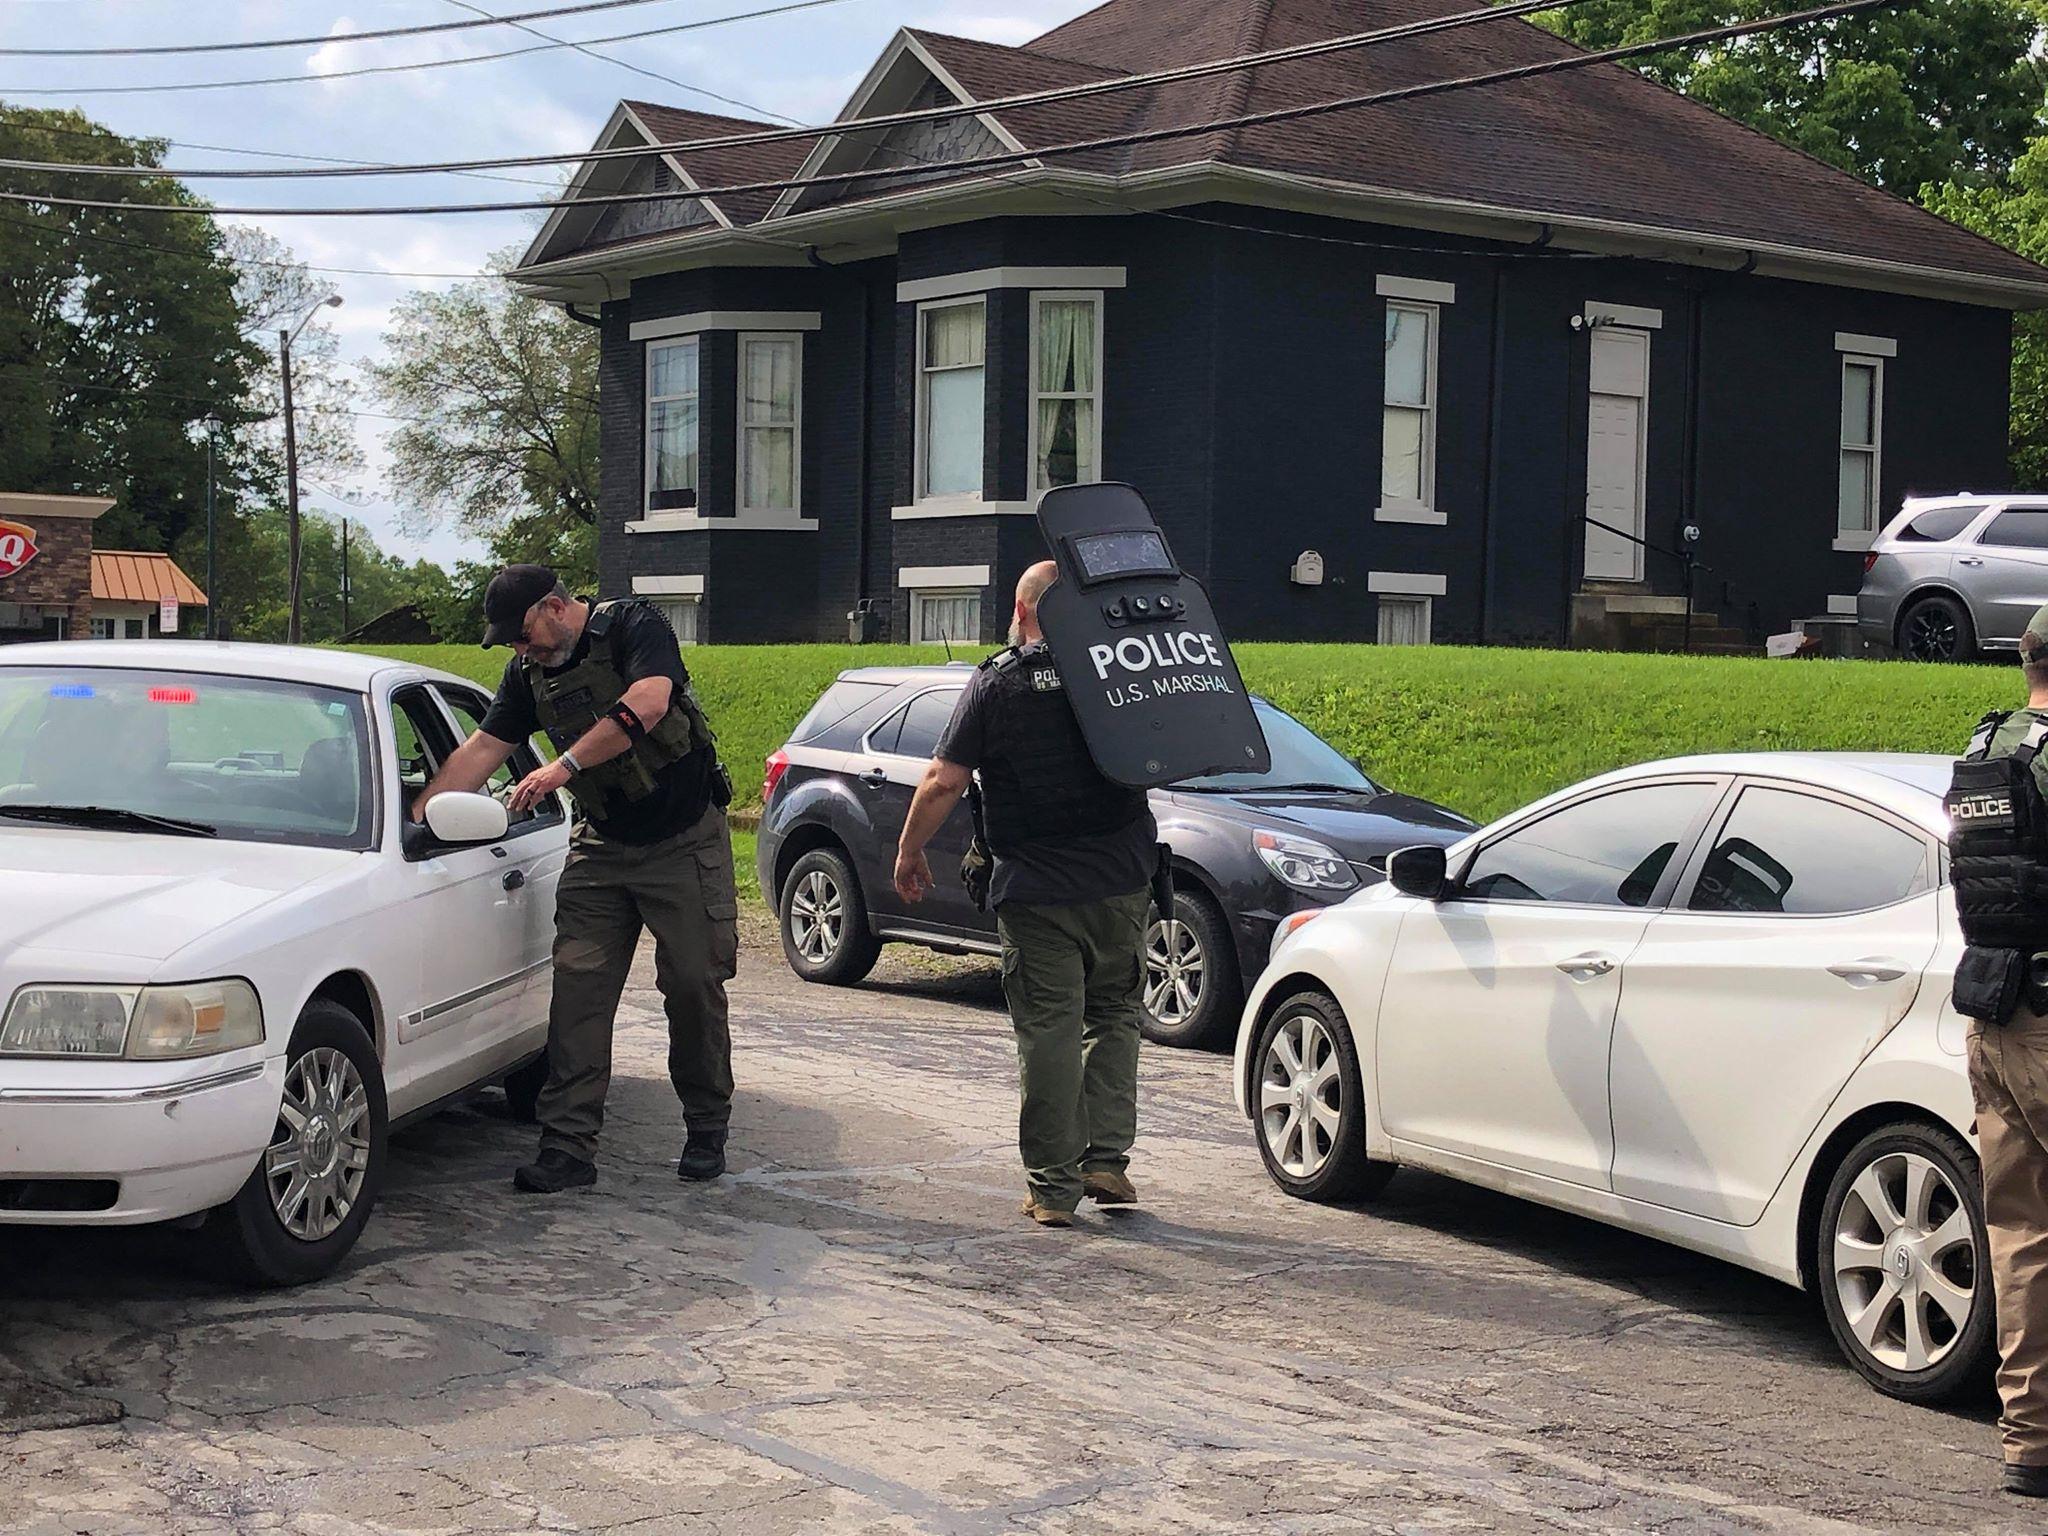 US Marshalls, Circleville Police and Probation Arrest One After